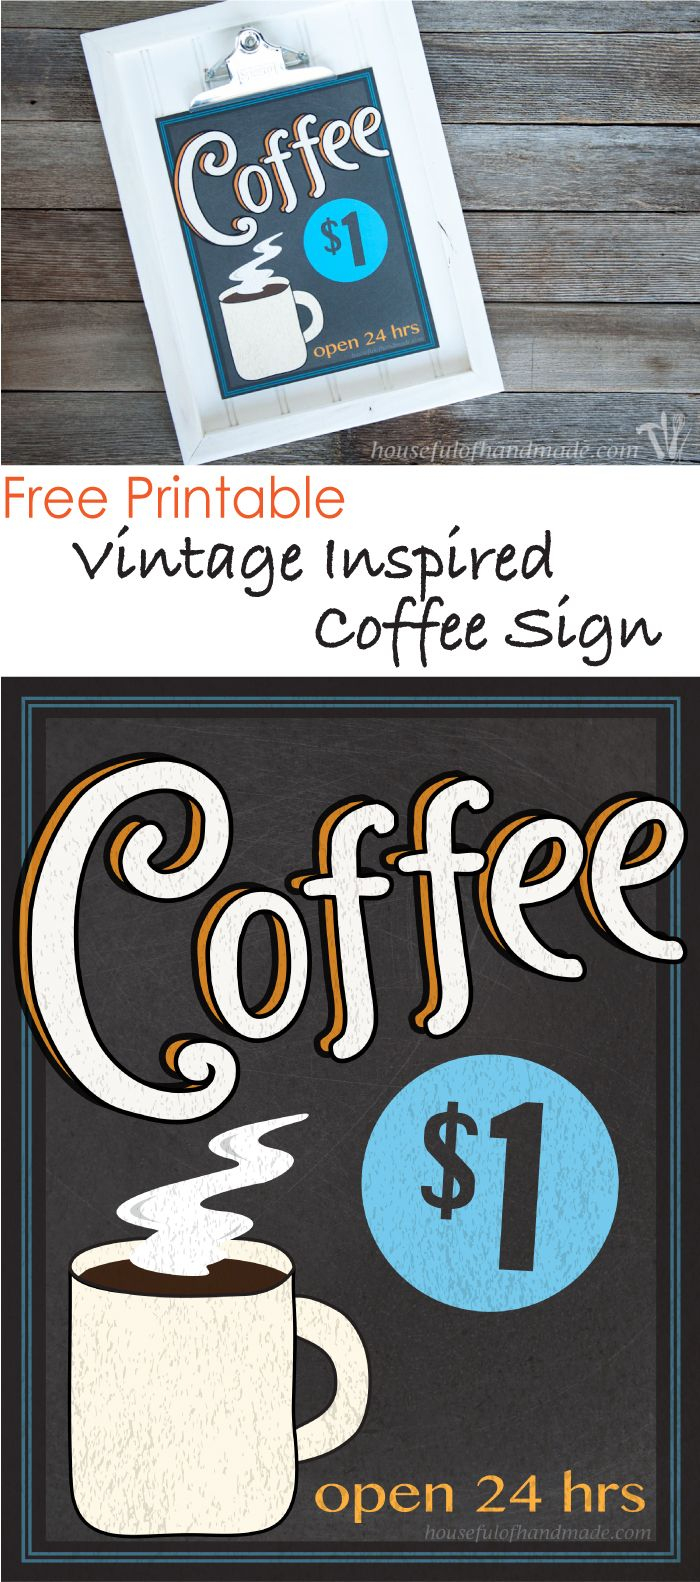 Free Printable Vintage Inspired Coffee Sign | Fonts & Printables - Free Printable Coffee Bar Signs